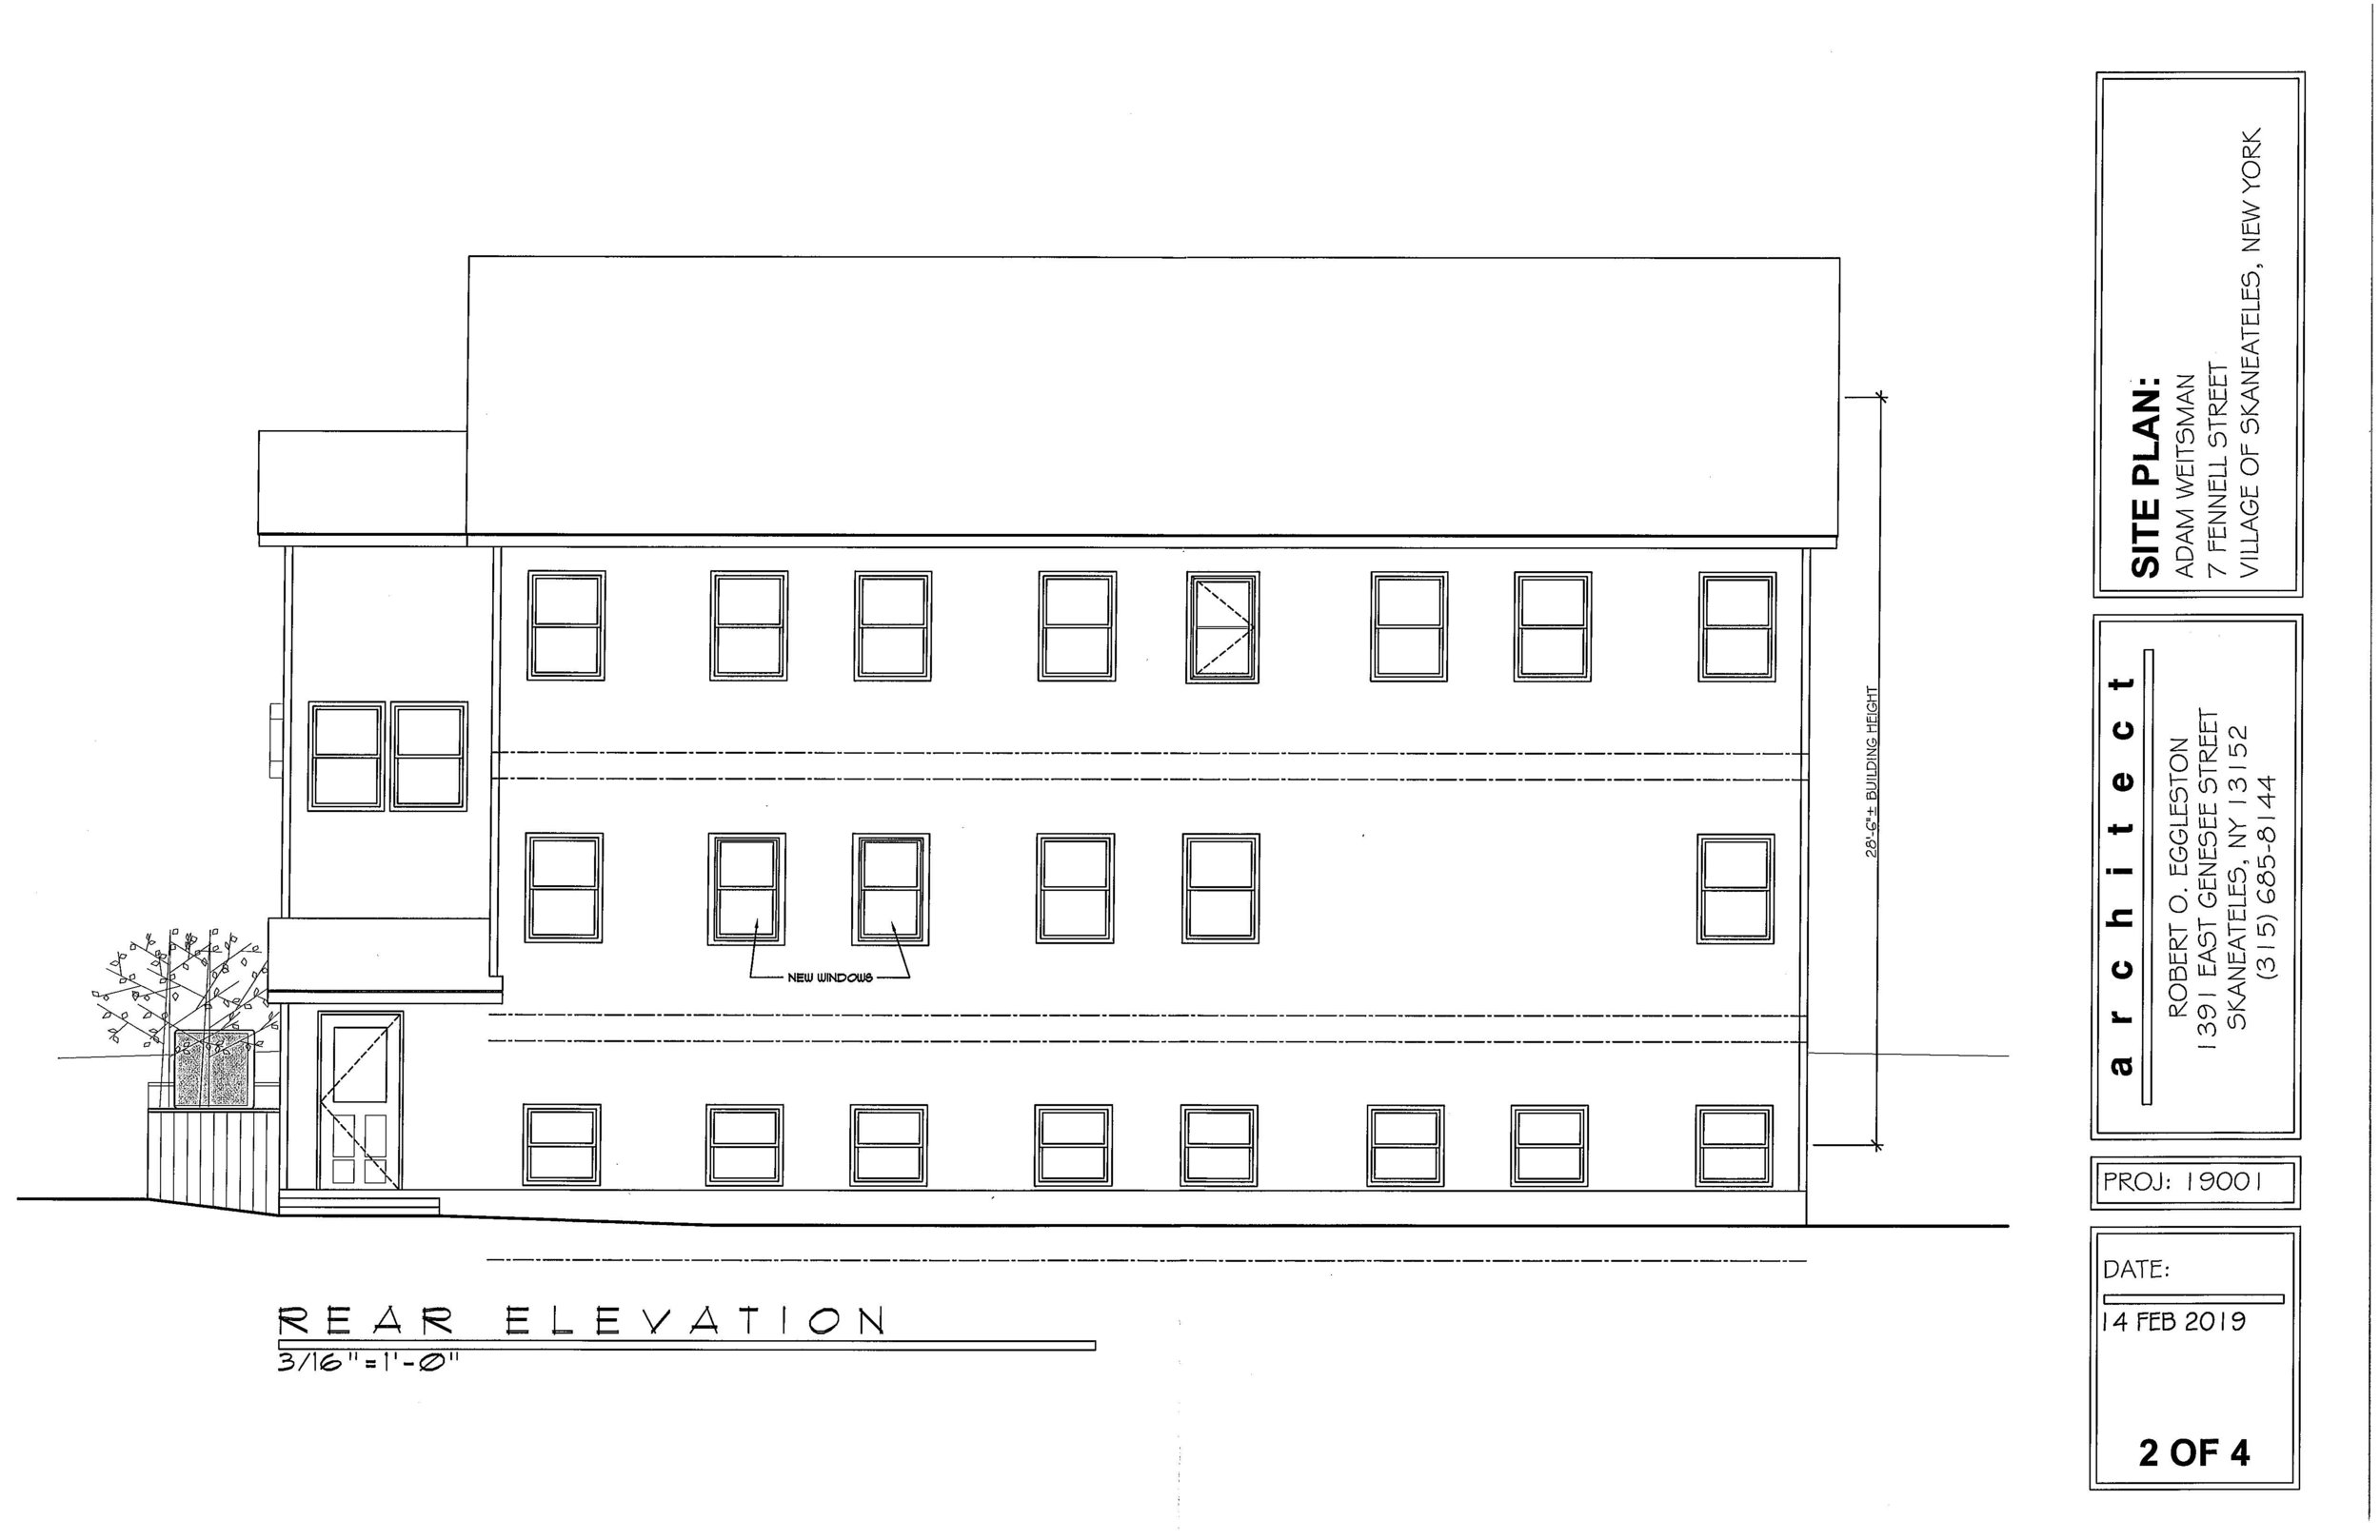 Rear Elevation Architectural Drawing 7 Fennell Street Skaneateles Commercial Real Estate For Sale Michael DeRosa Licensed Real Estate Broker of Michael DeRosa Exchange, LLC.jpg